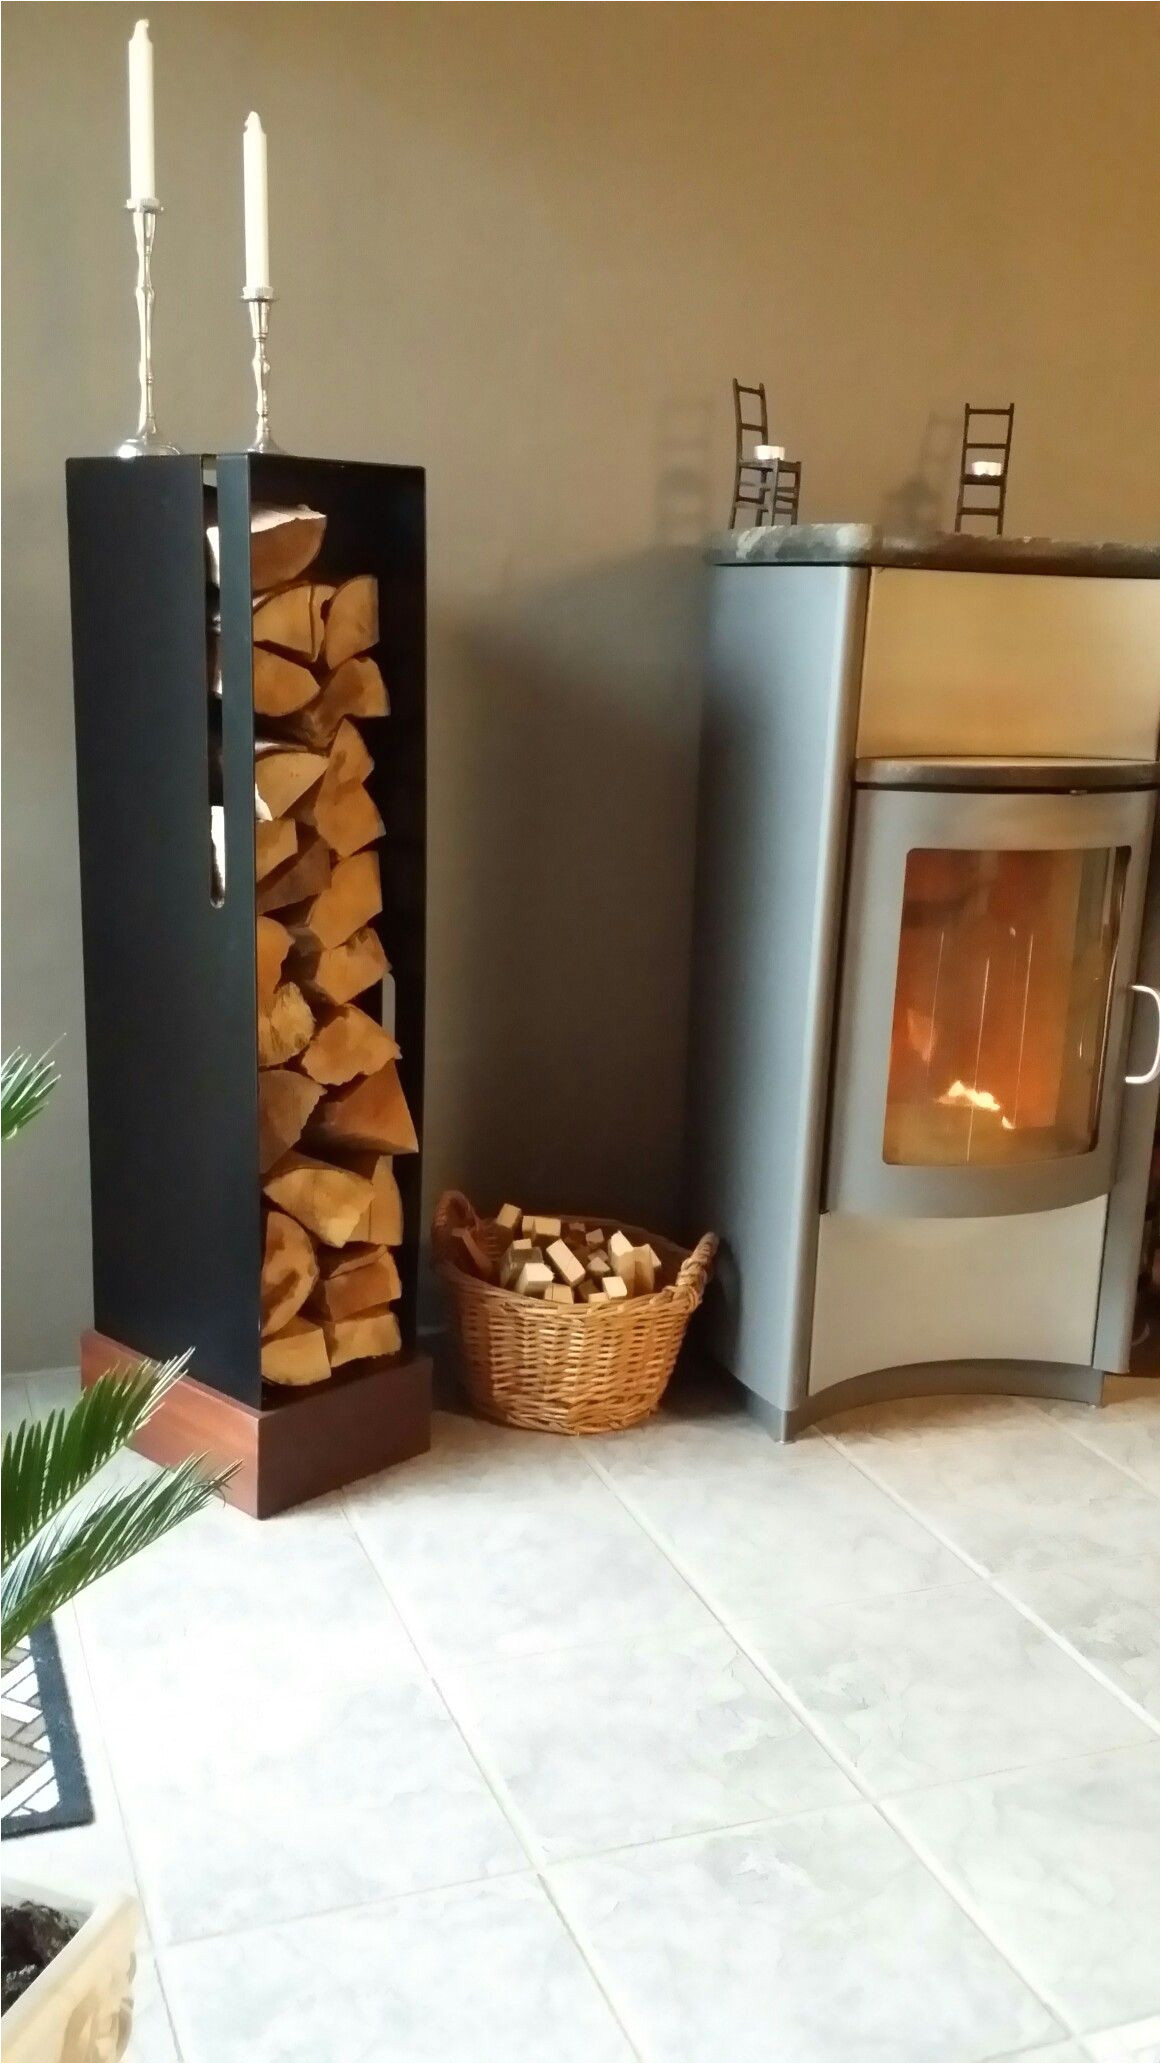 Diy Indoor Firewood Rack Captivating Fireplace Wood Holder and Firewood Storage Indoor Diy